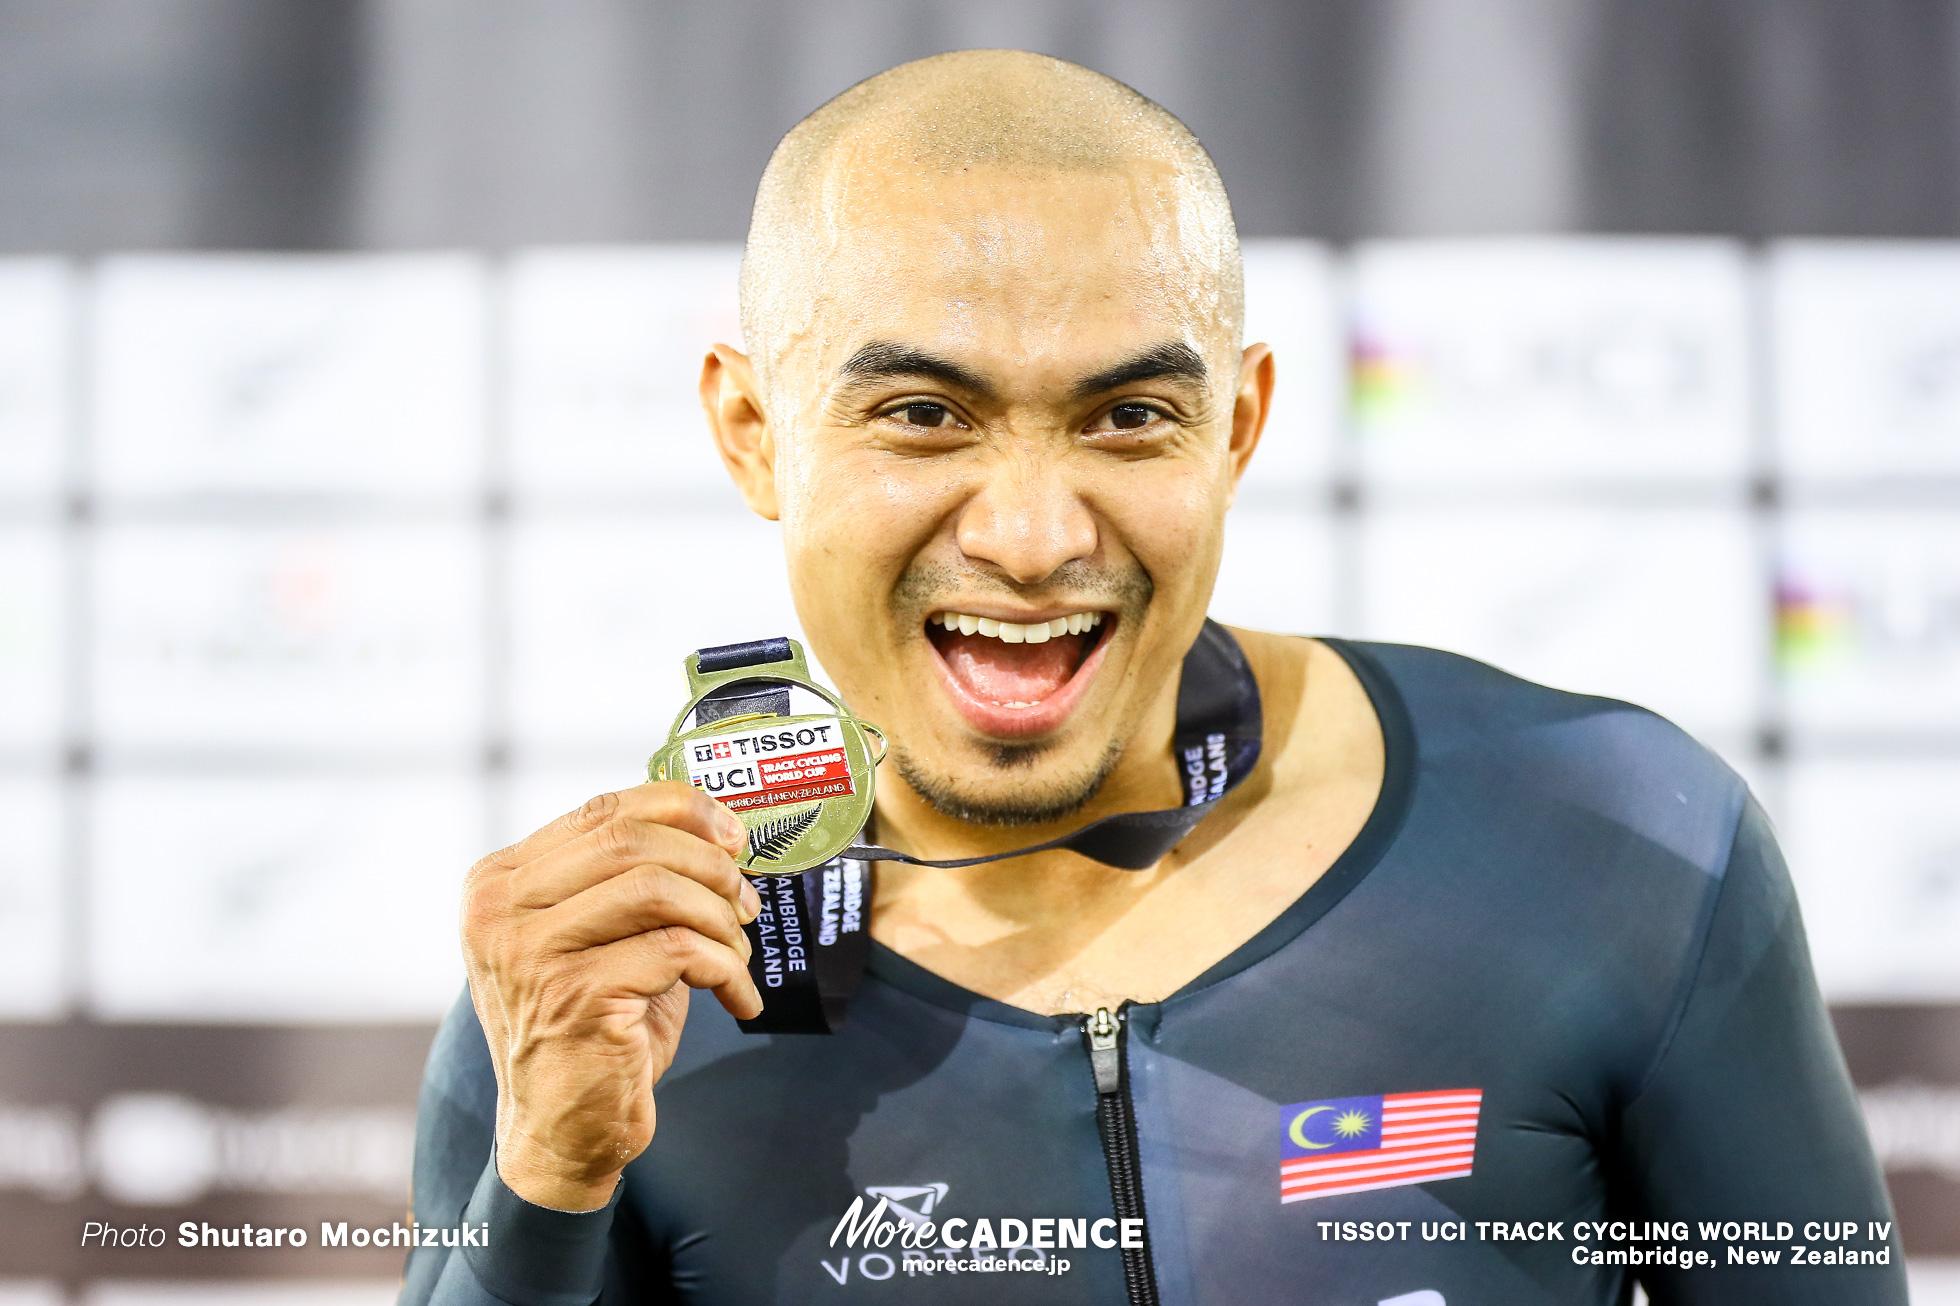 Final / Men's Keirin / TISSOT UCI TRACK CYCLING WORLD CUP IV, Cambridge, New Zealand, Mohd Azizulhasni AWANG アジズルハスニ・アワン